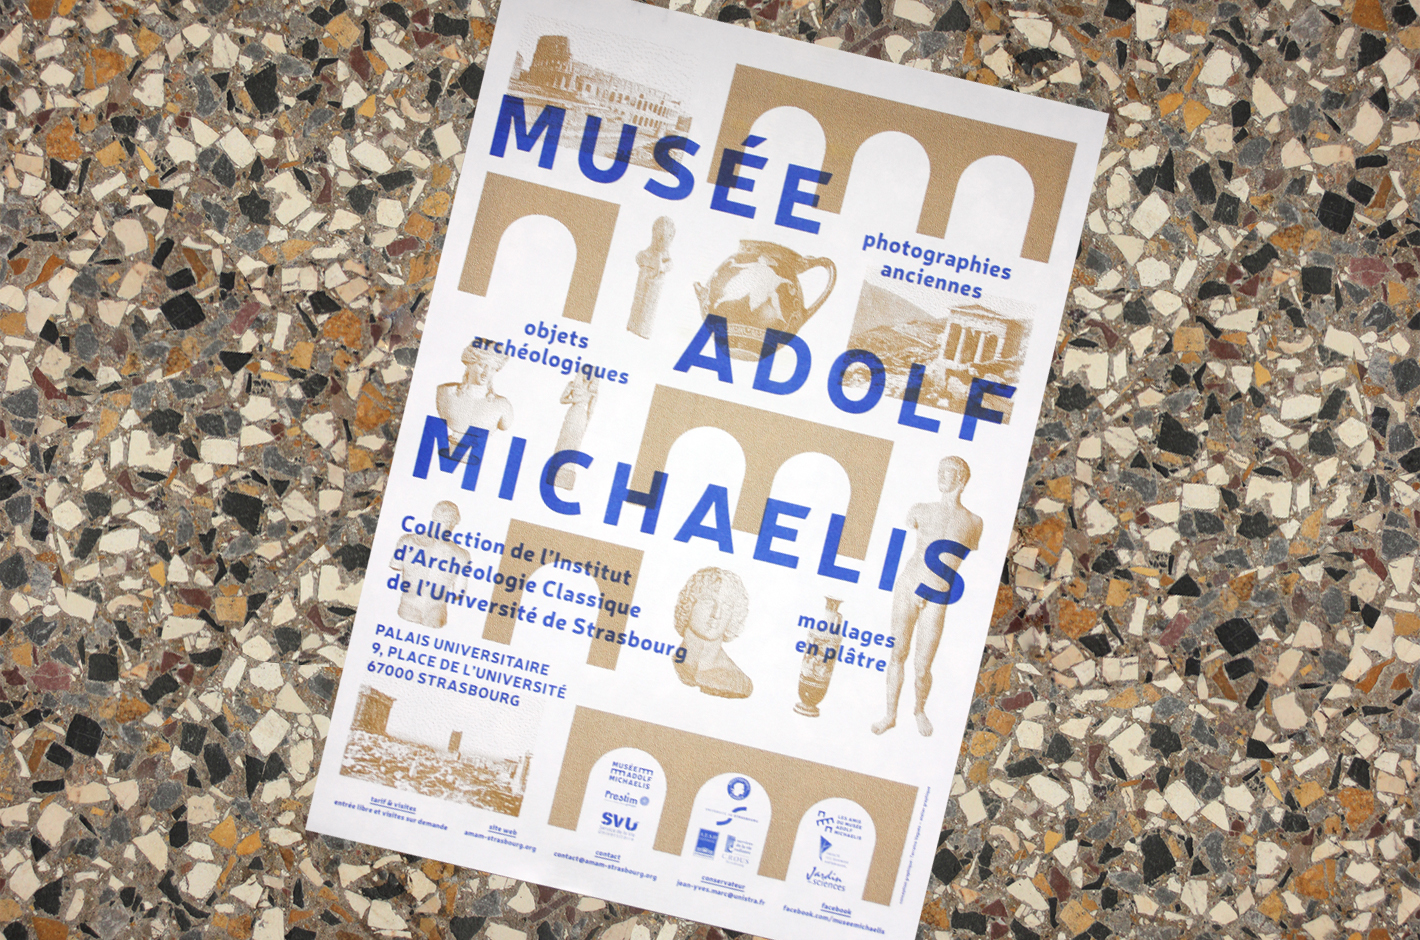 Musée Adolf Michaelis —affiche